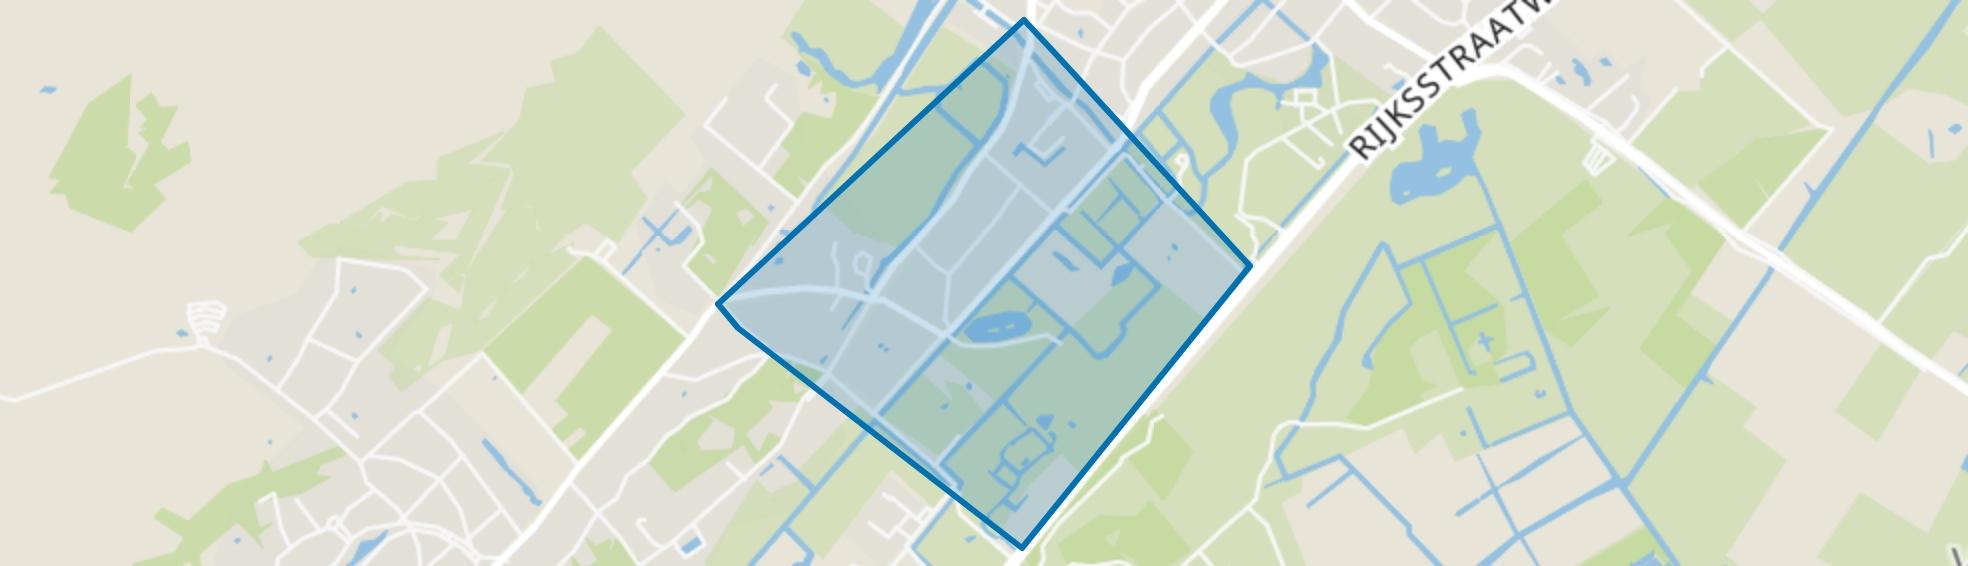 Drie Papegaaien, Wassenaar map